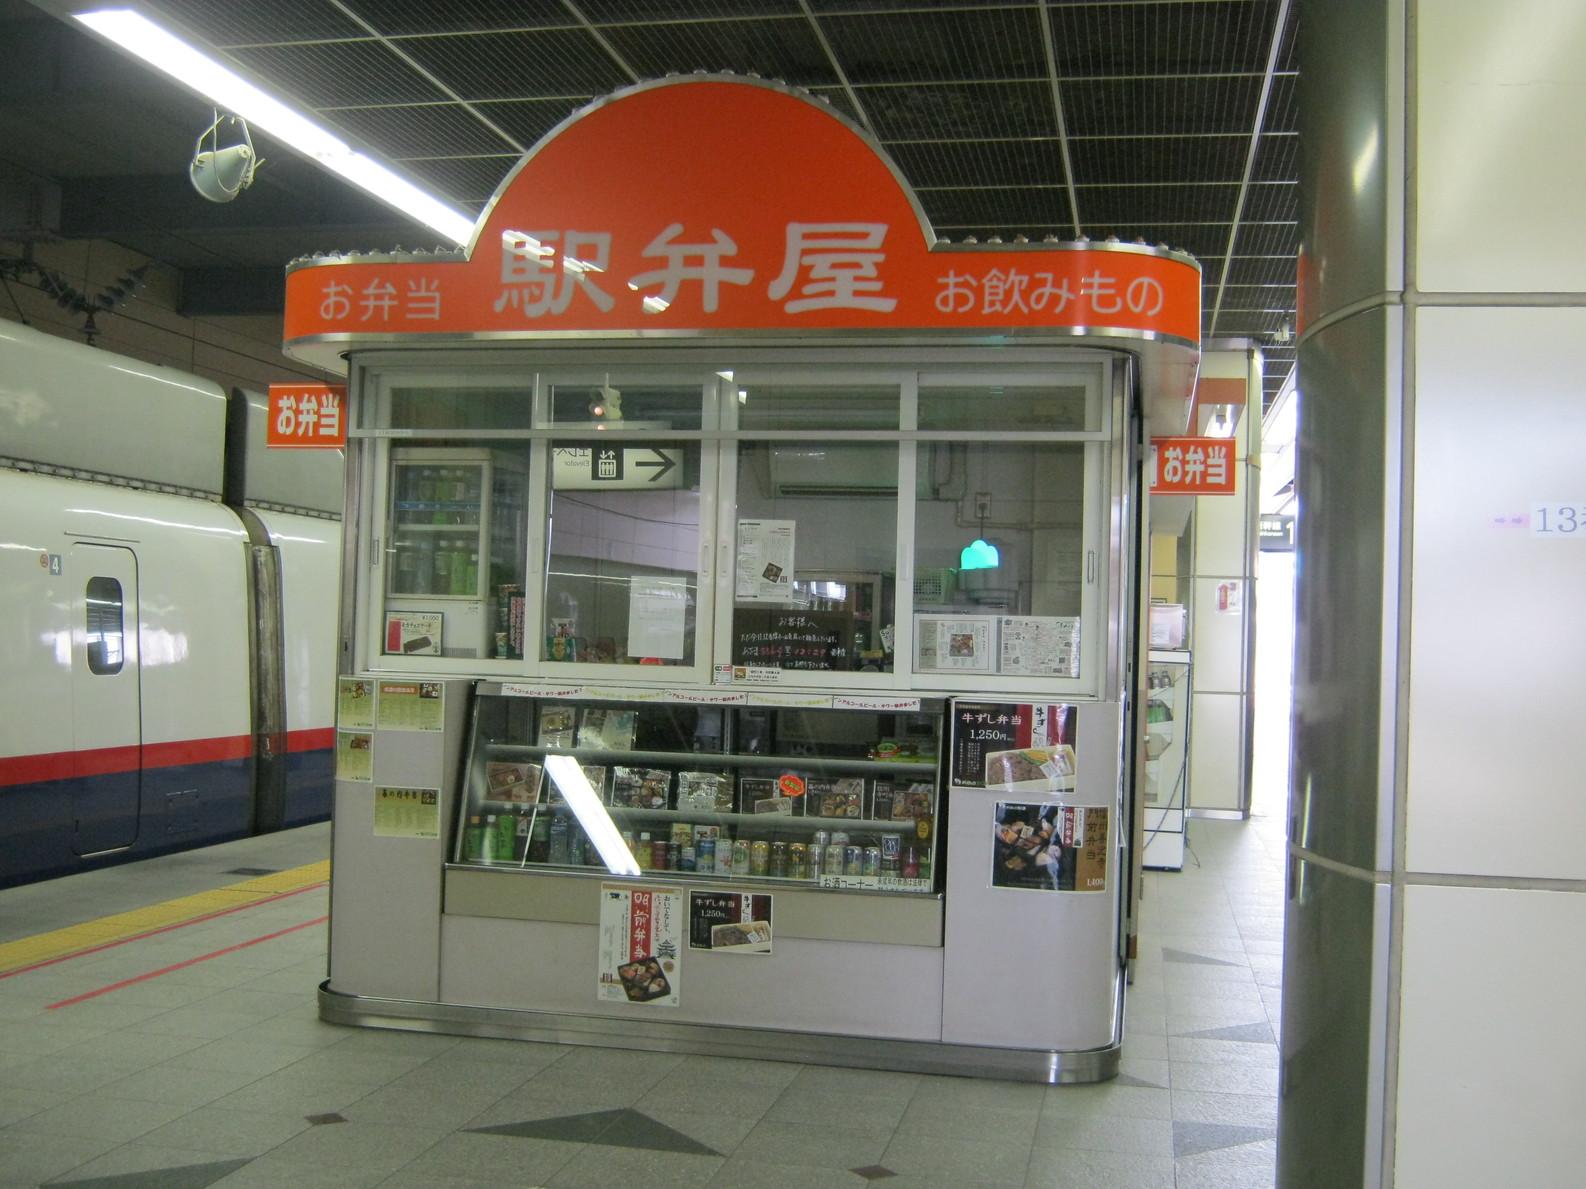 駅弁屋 長野駅新幹線上りホーム売店 name=